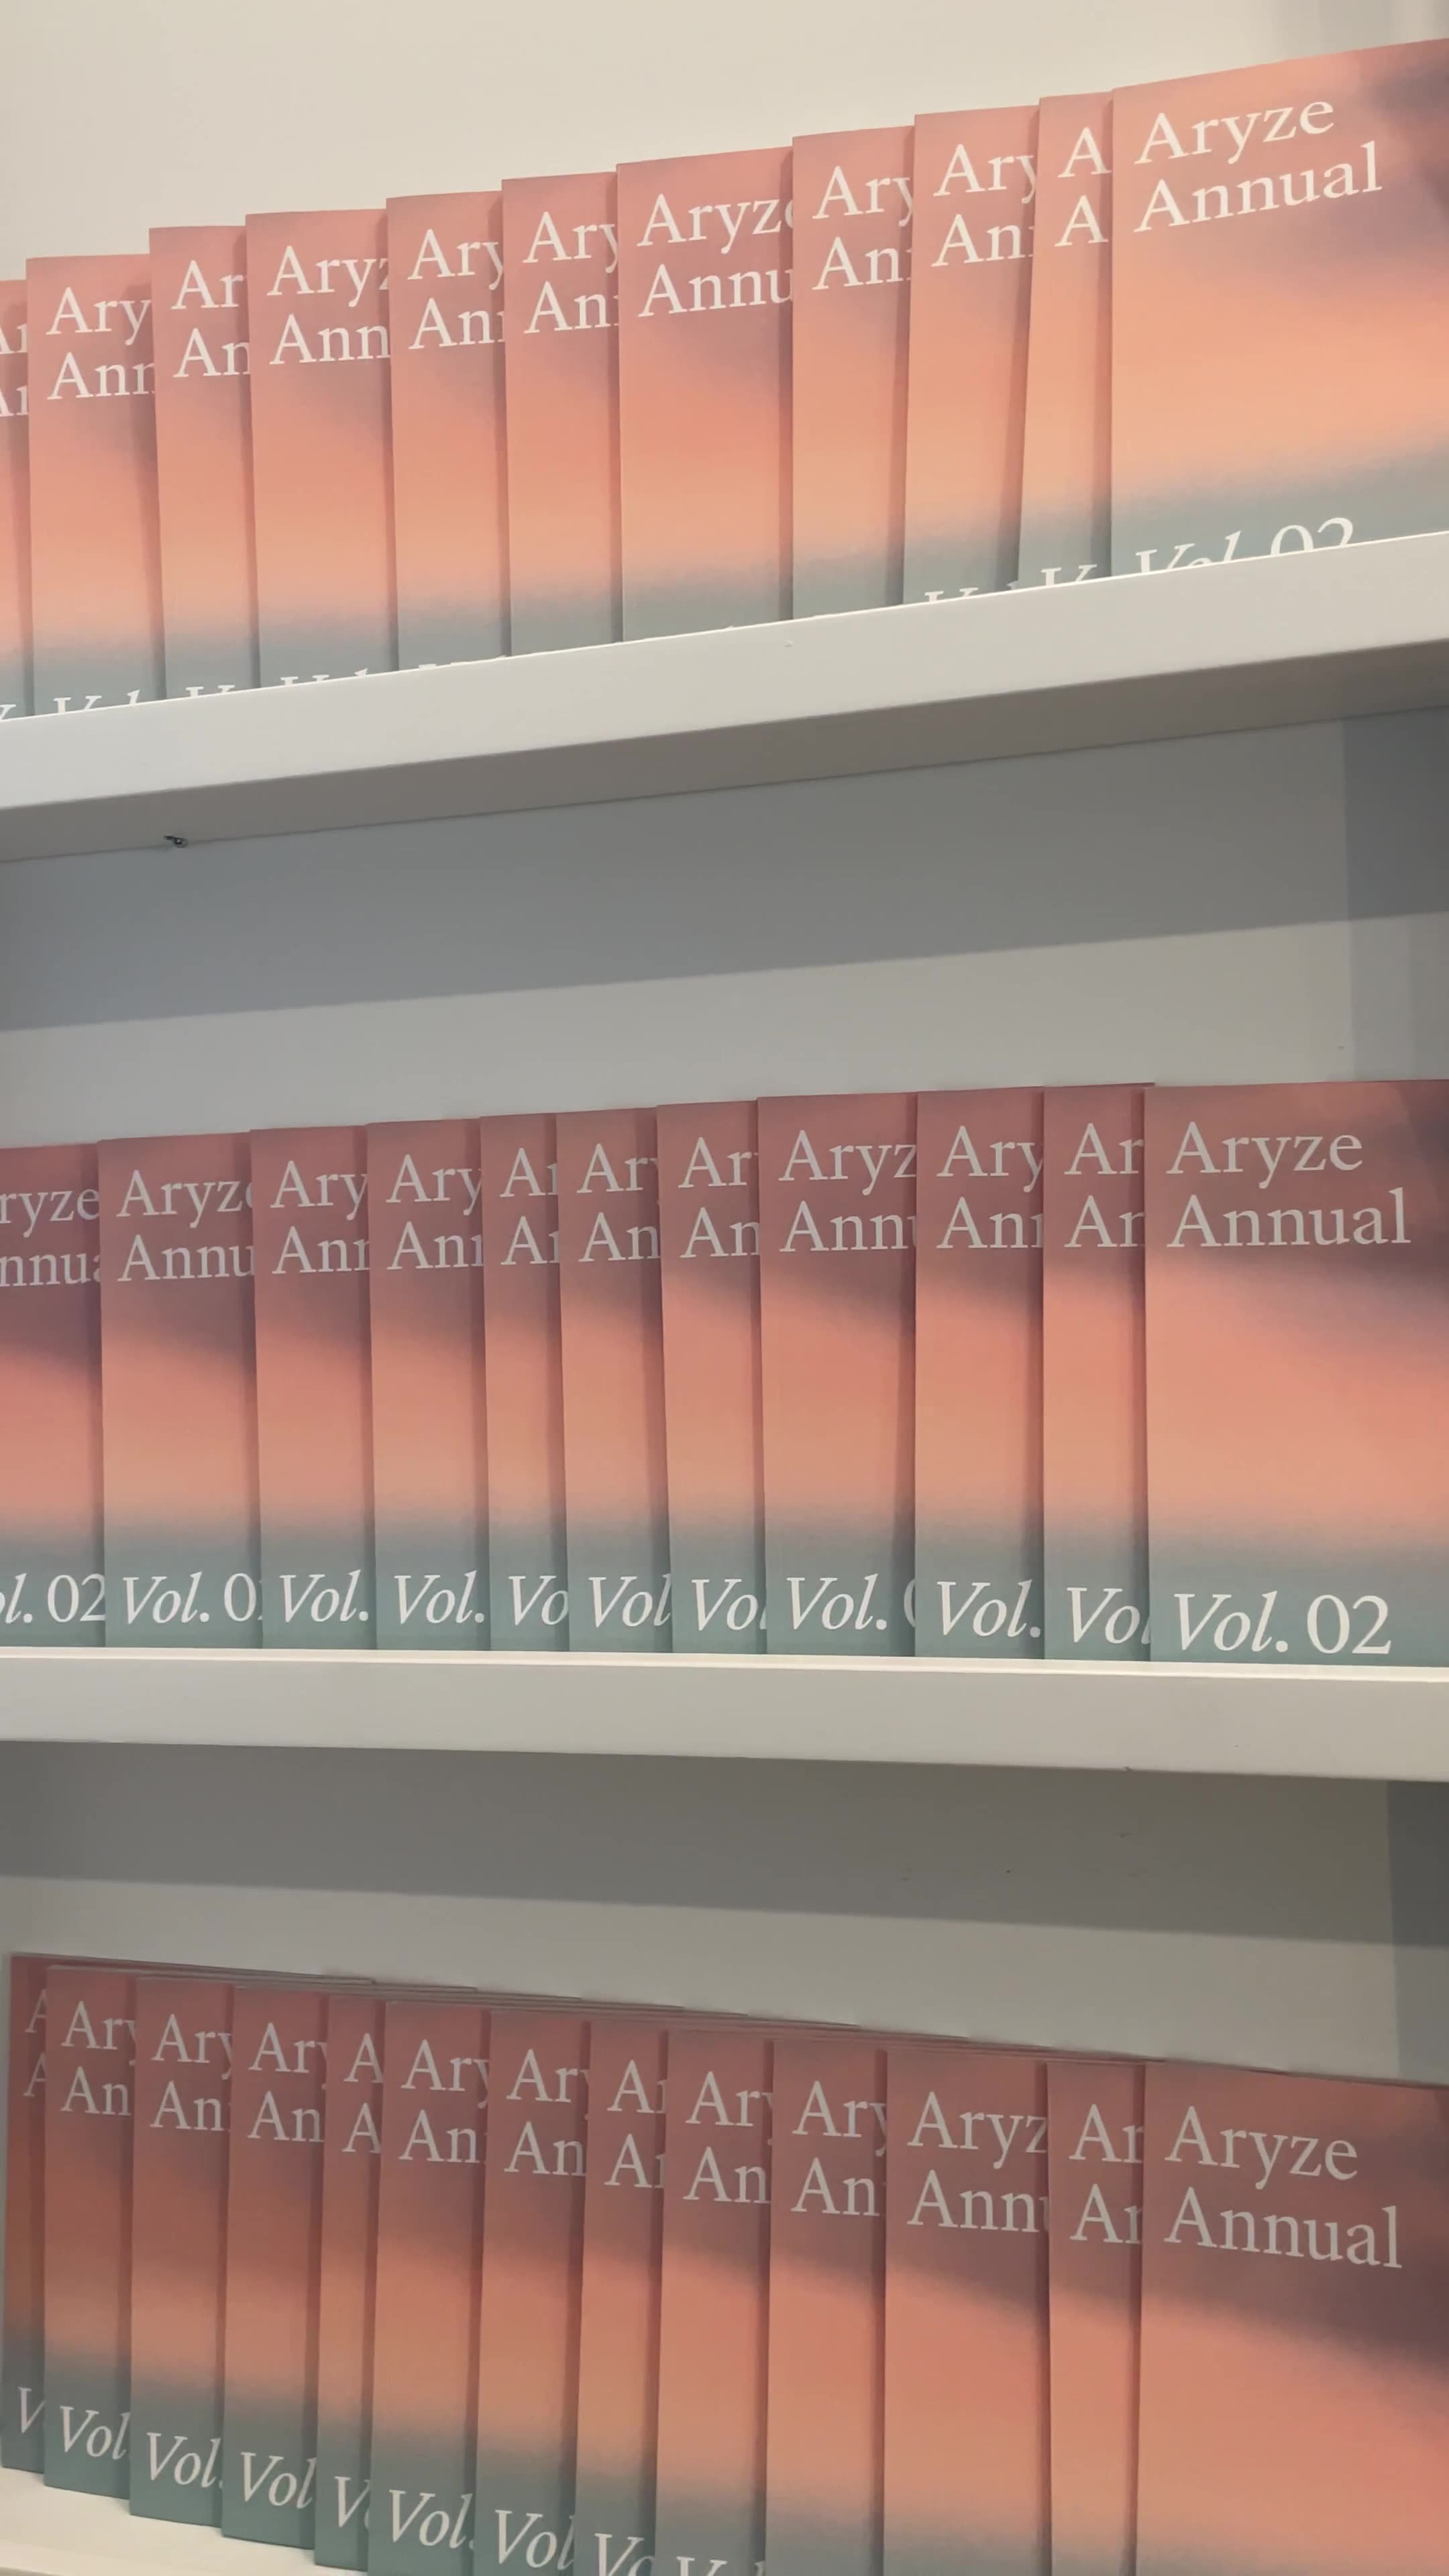 Aryze Annual Display.jpg